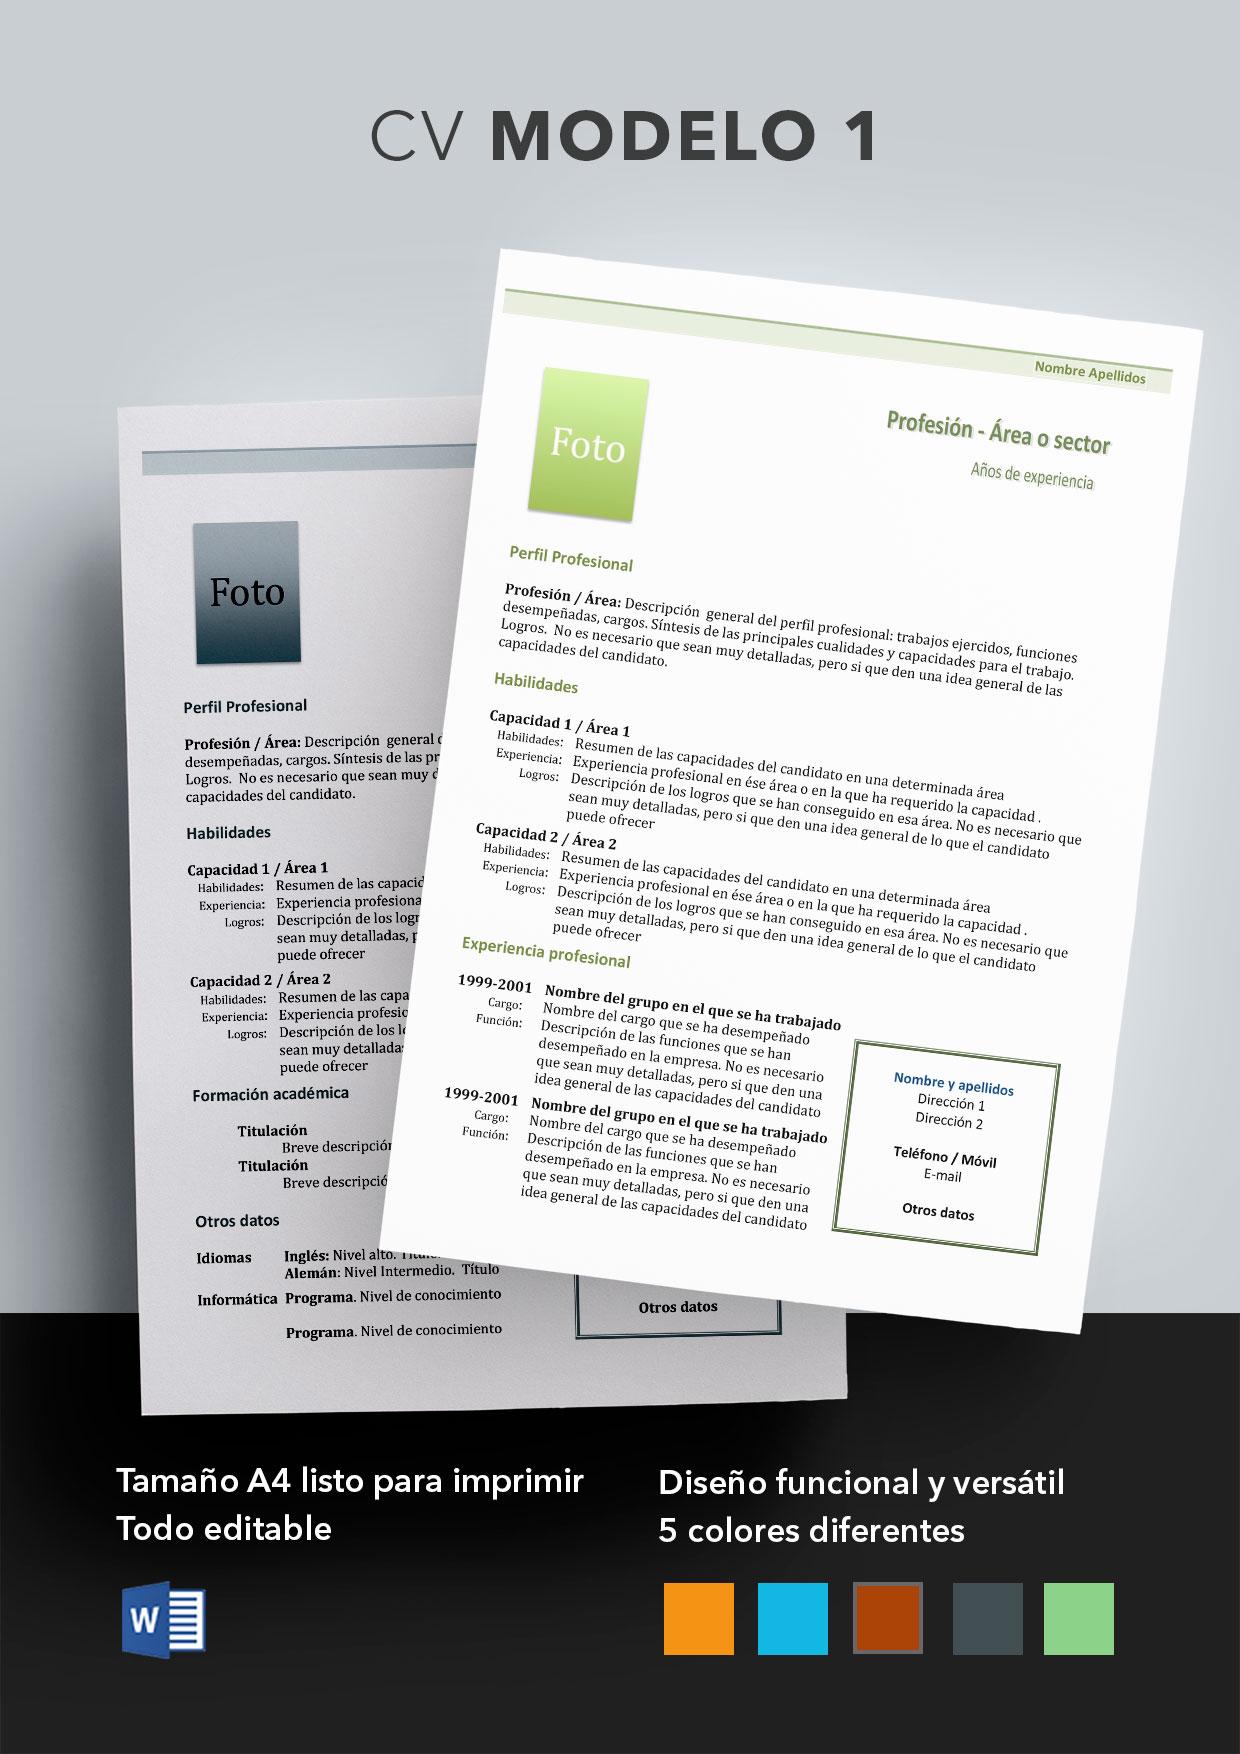 Curriculum vitae Modelo 1 | Plantillas de curriculum